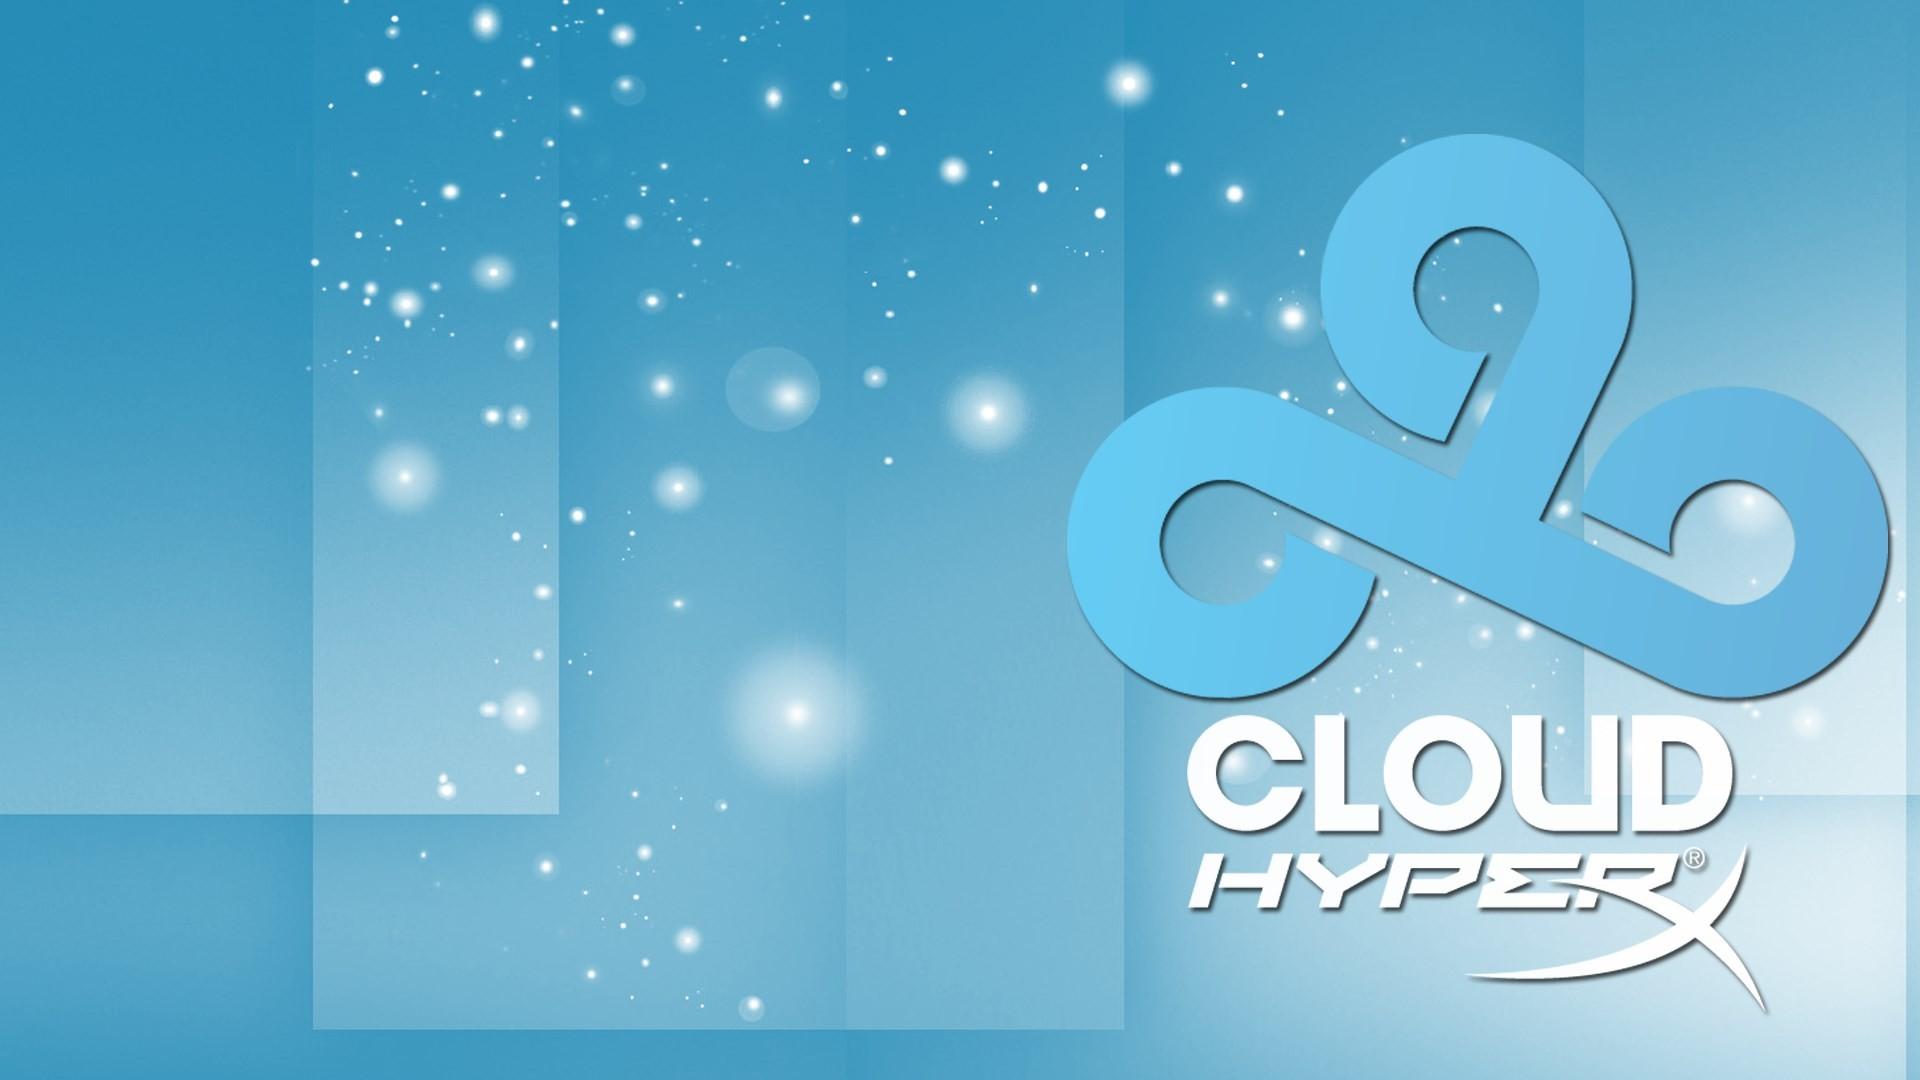 cloud 9 iphone wallpaper …